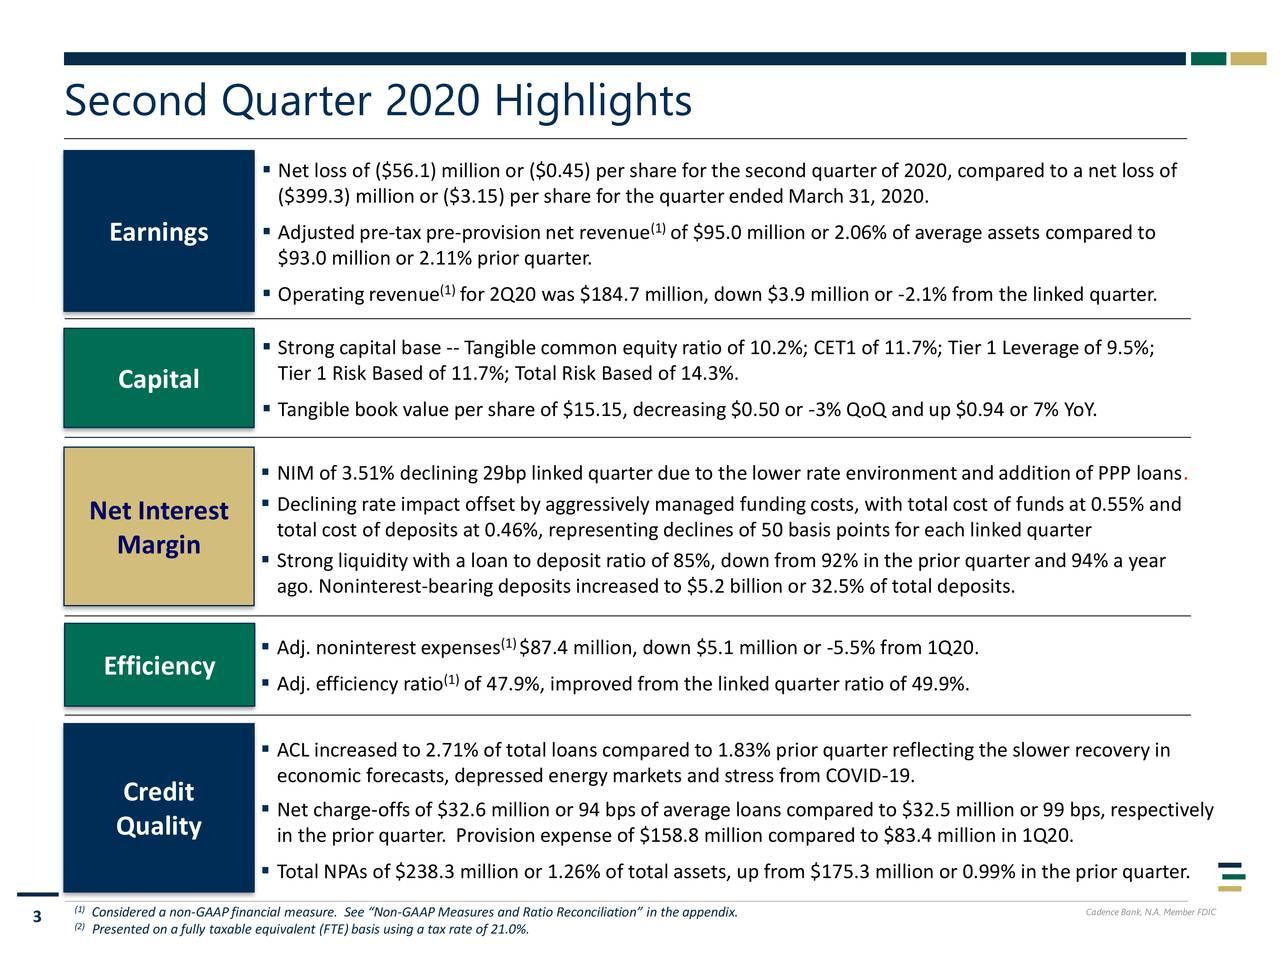 Second Quarter 2020 Highlights